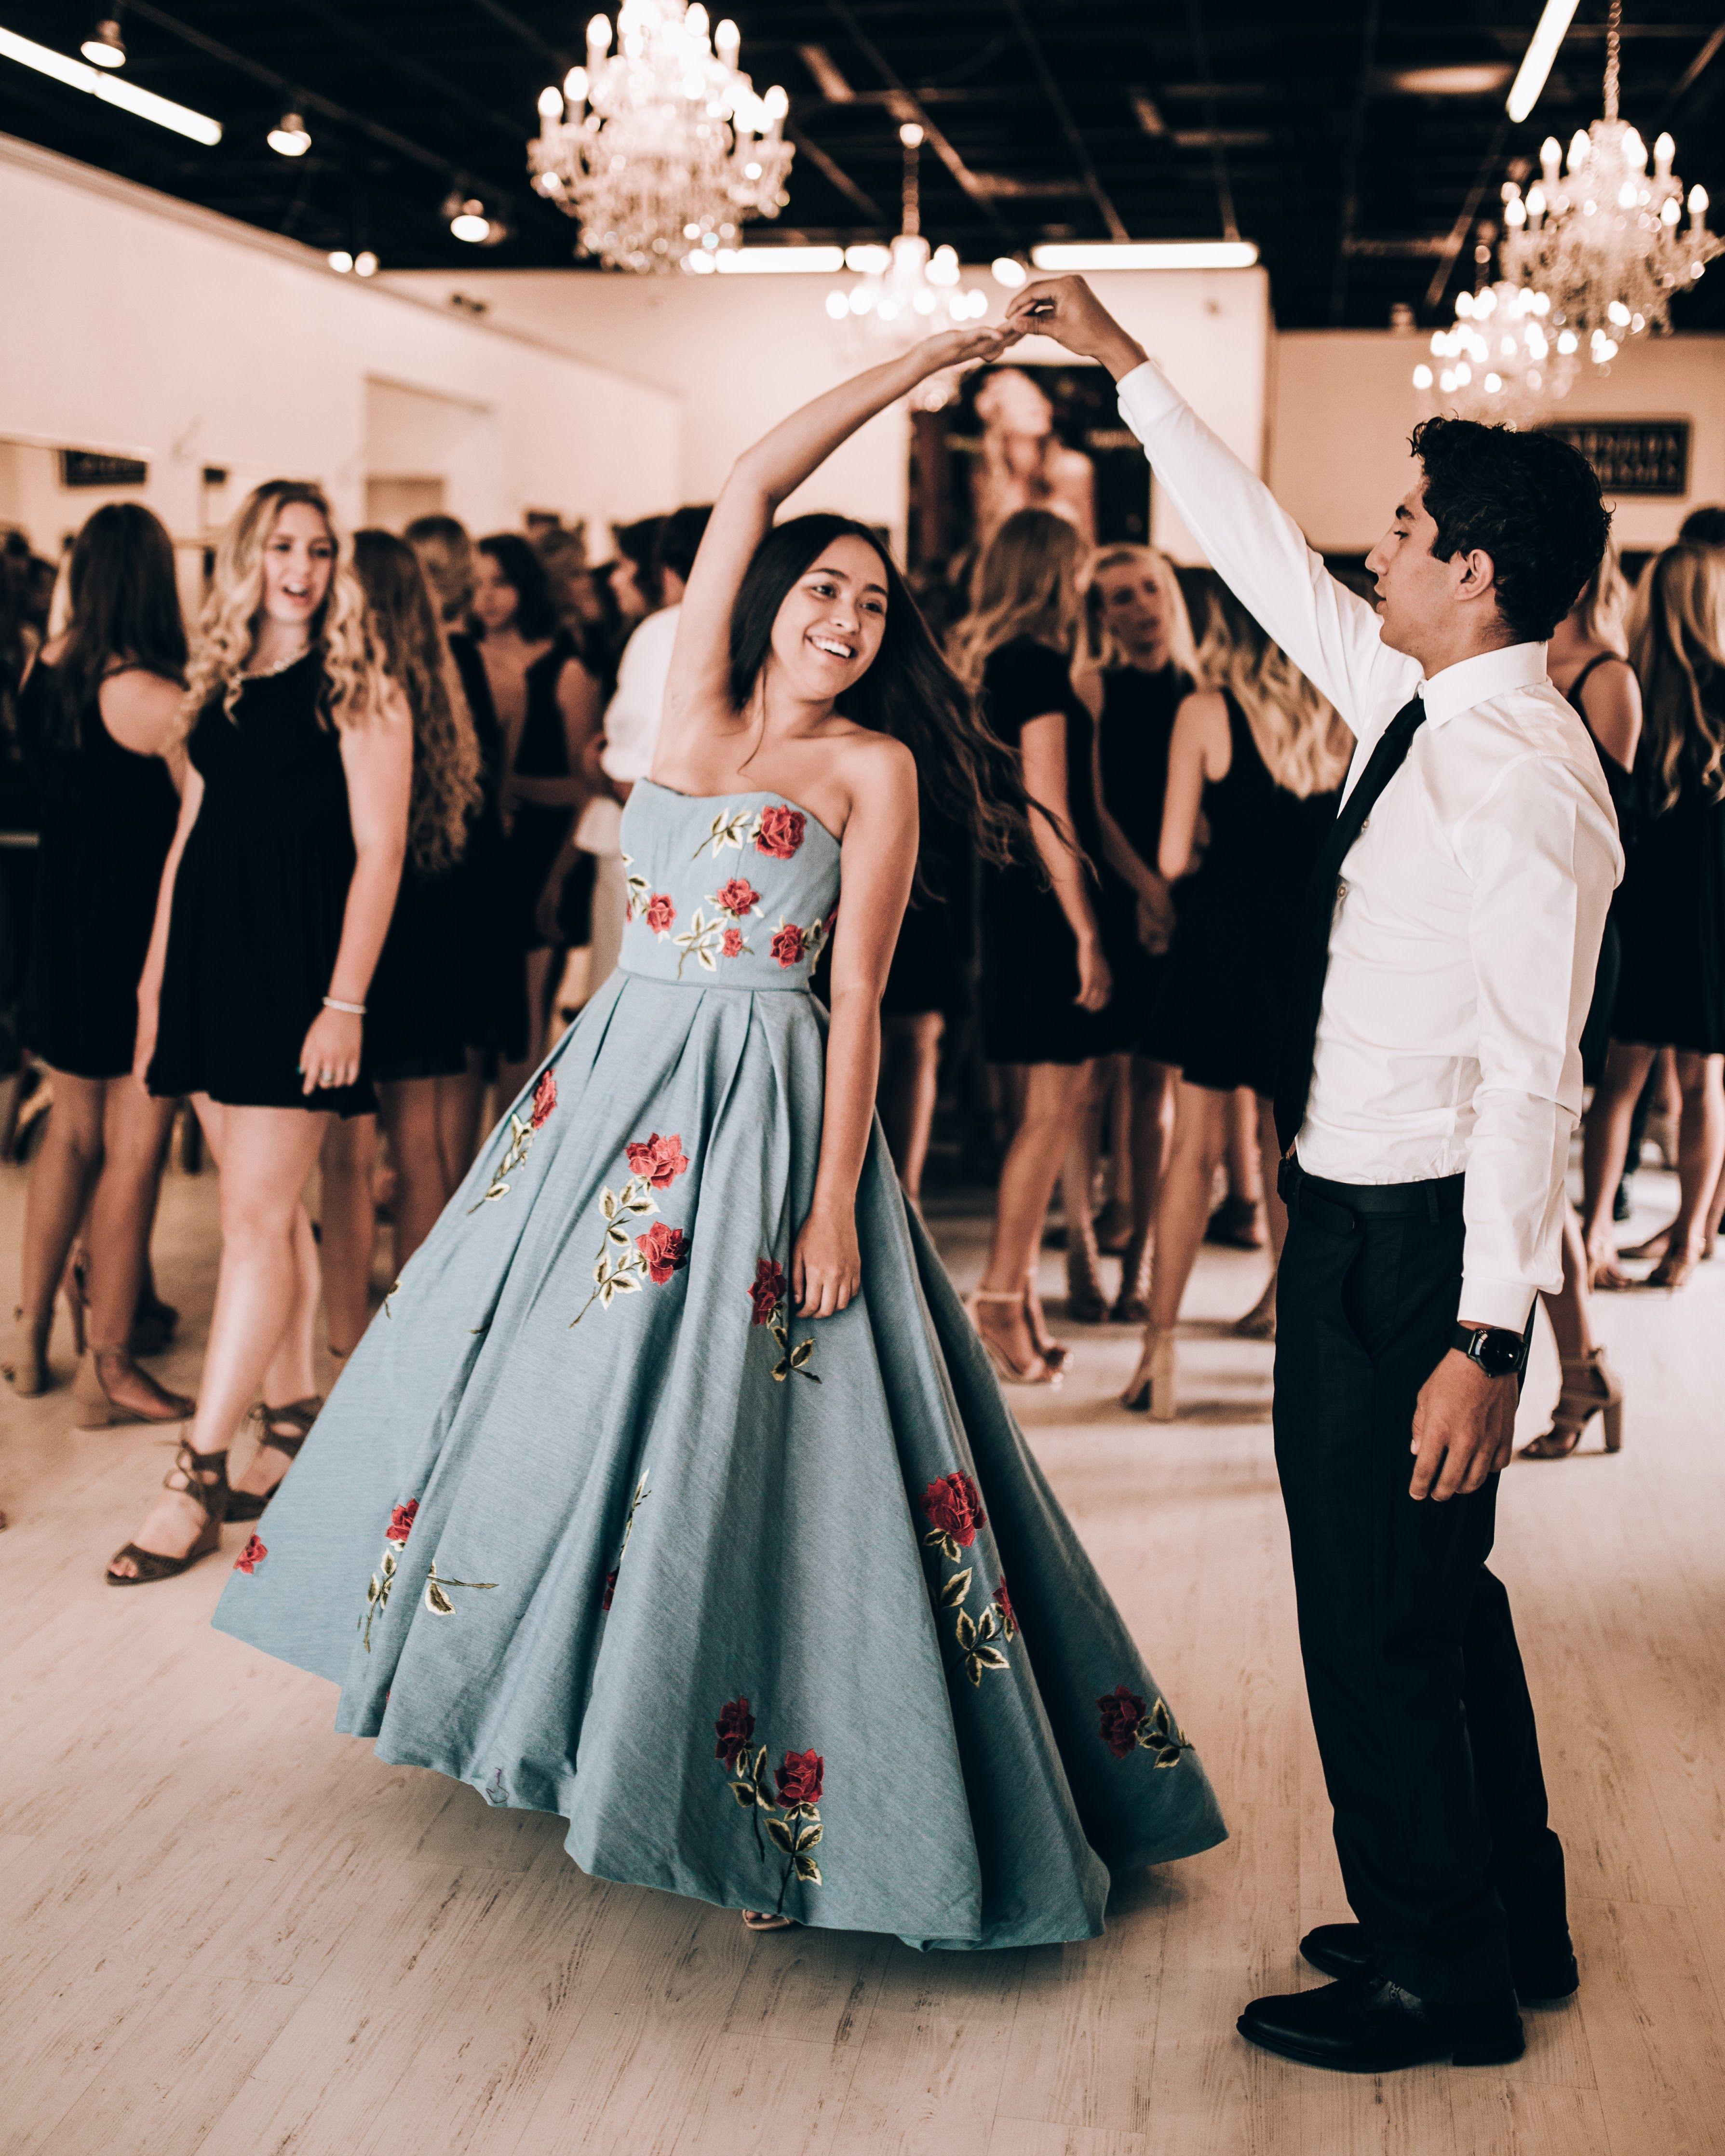 6c21db84b6d Sherri Hill floral print blue tea length strapless dress Ypsilon Dresses  Pageant Prom Homecoming Sweethearts Evening Wear Formal Gown School Dance  Black Tie ...